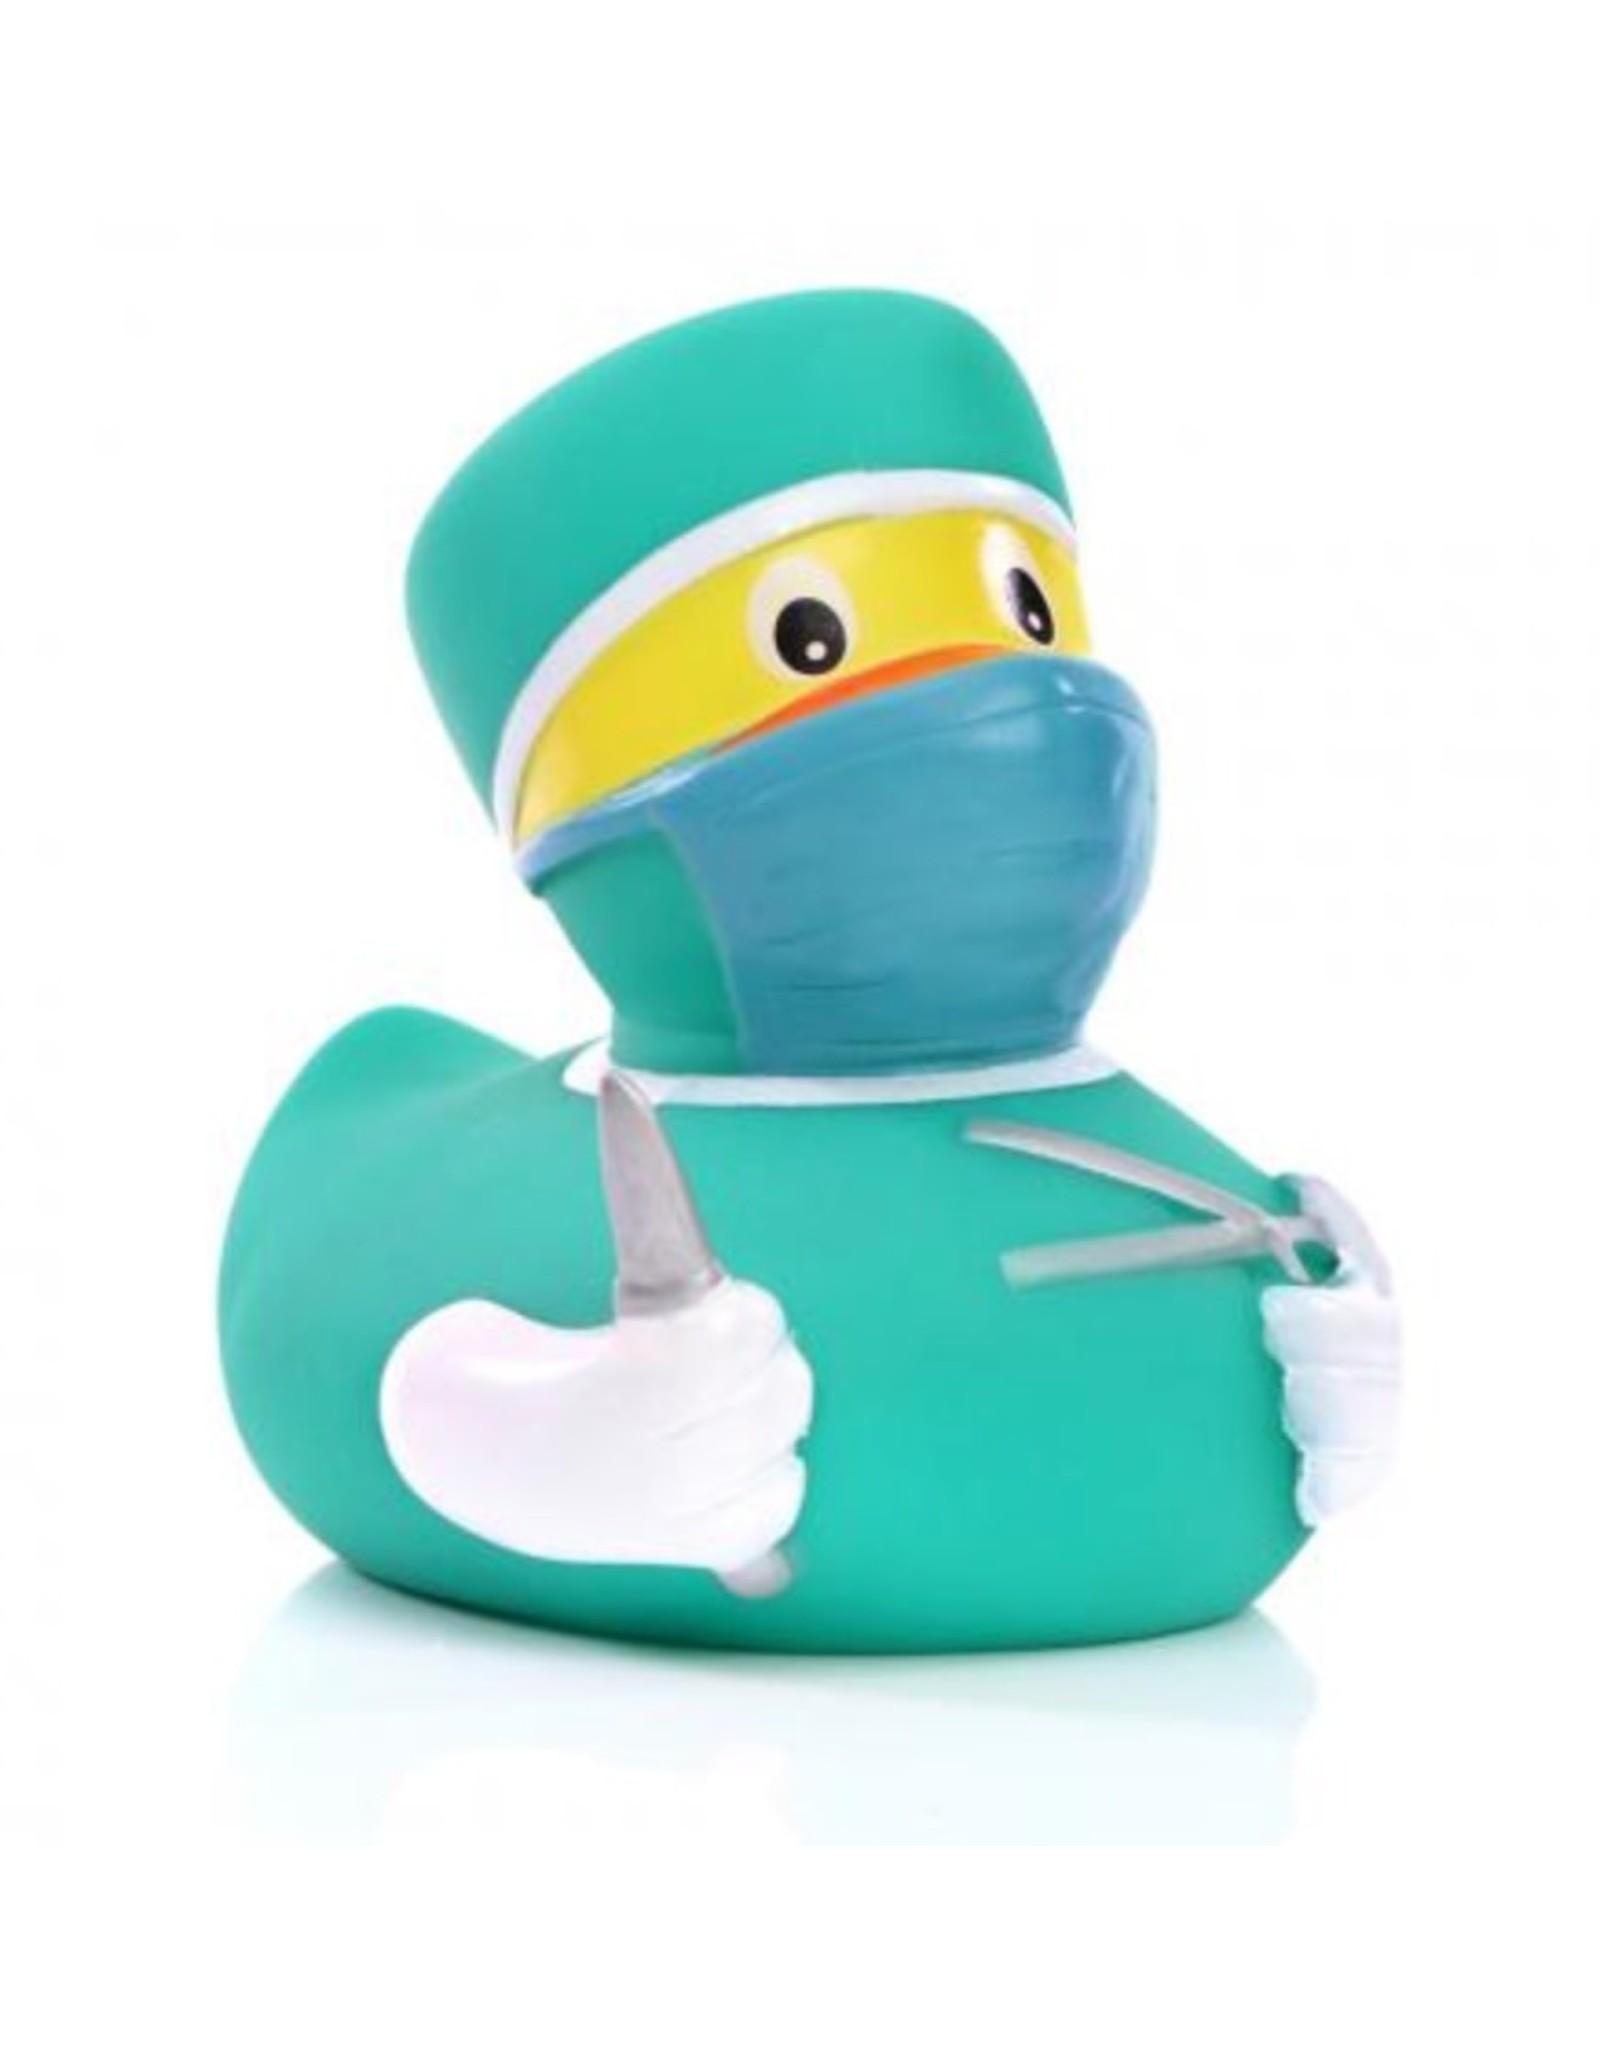 Surgeon Rubber Duck